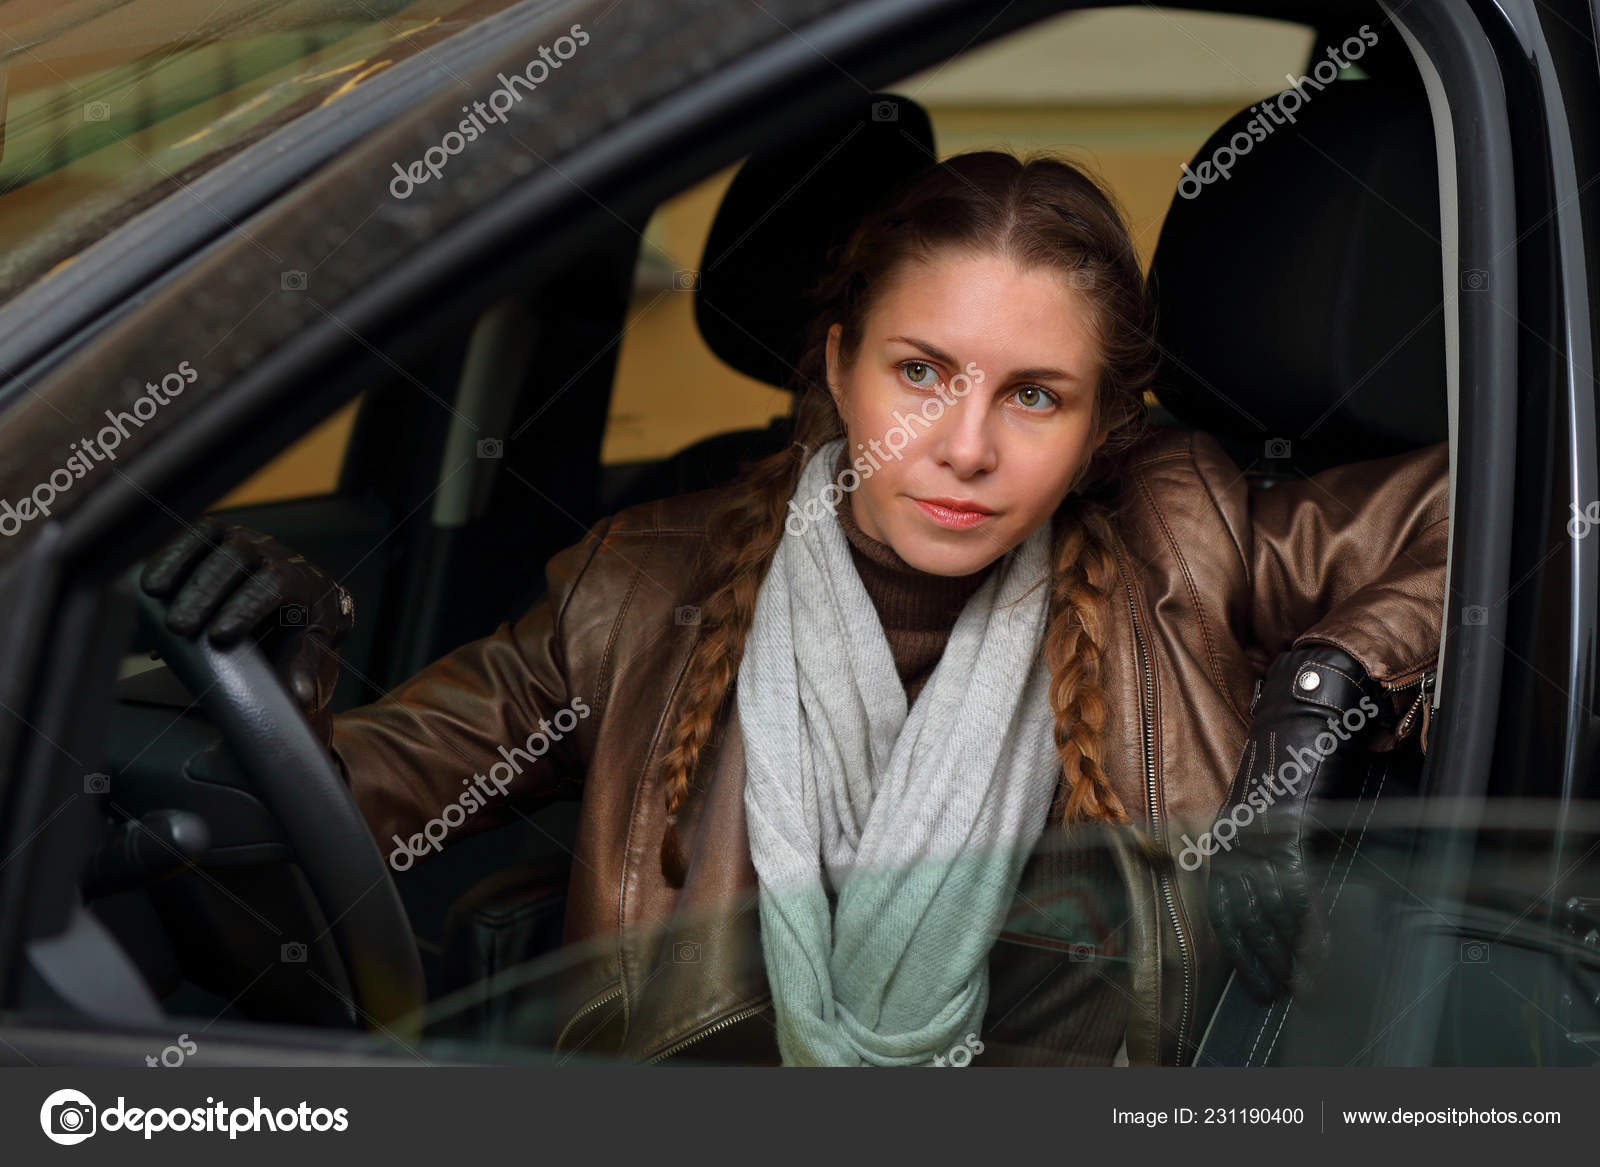 Beautiful Stylish Girl Leather Jacket Gloves Driving Car